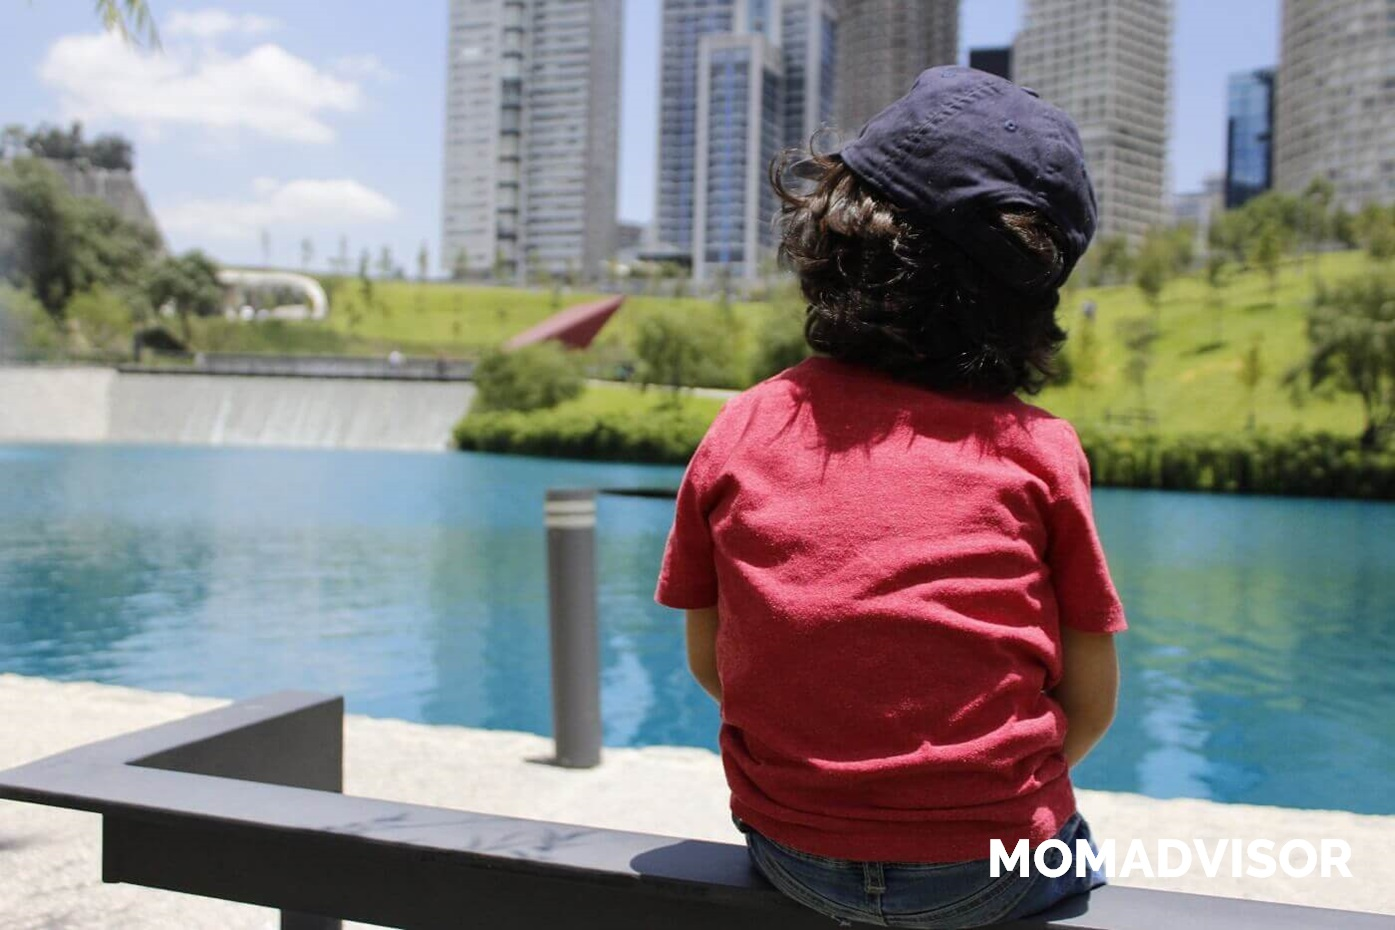 parque-la-mexicana-sc-momadvisor-logo